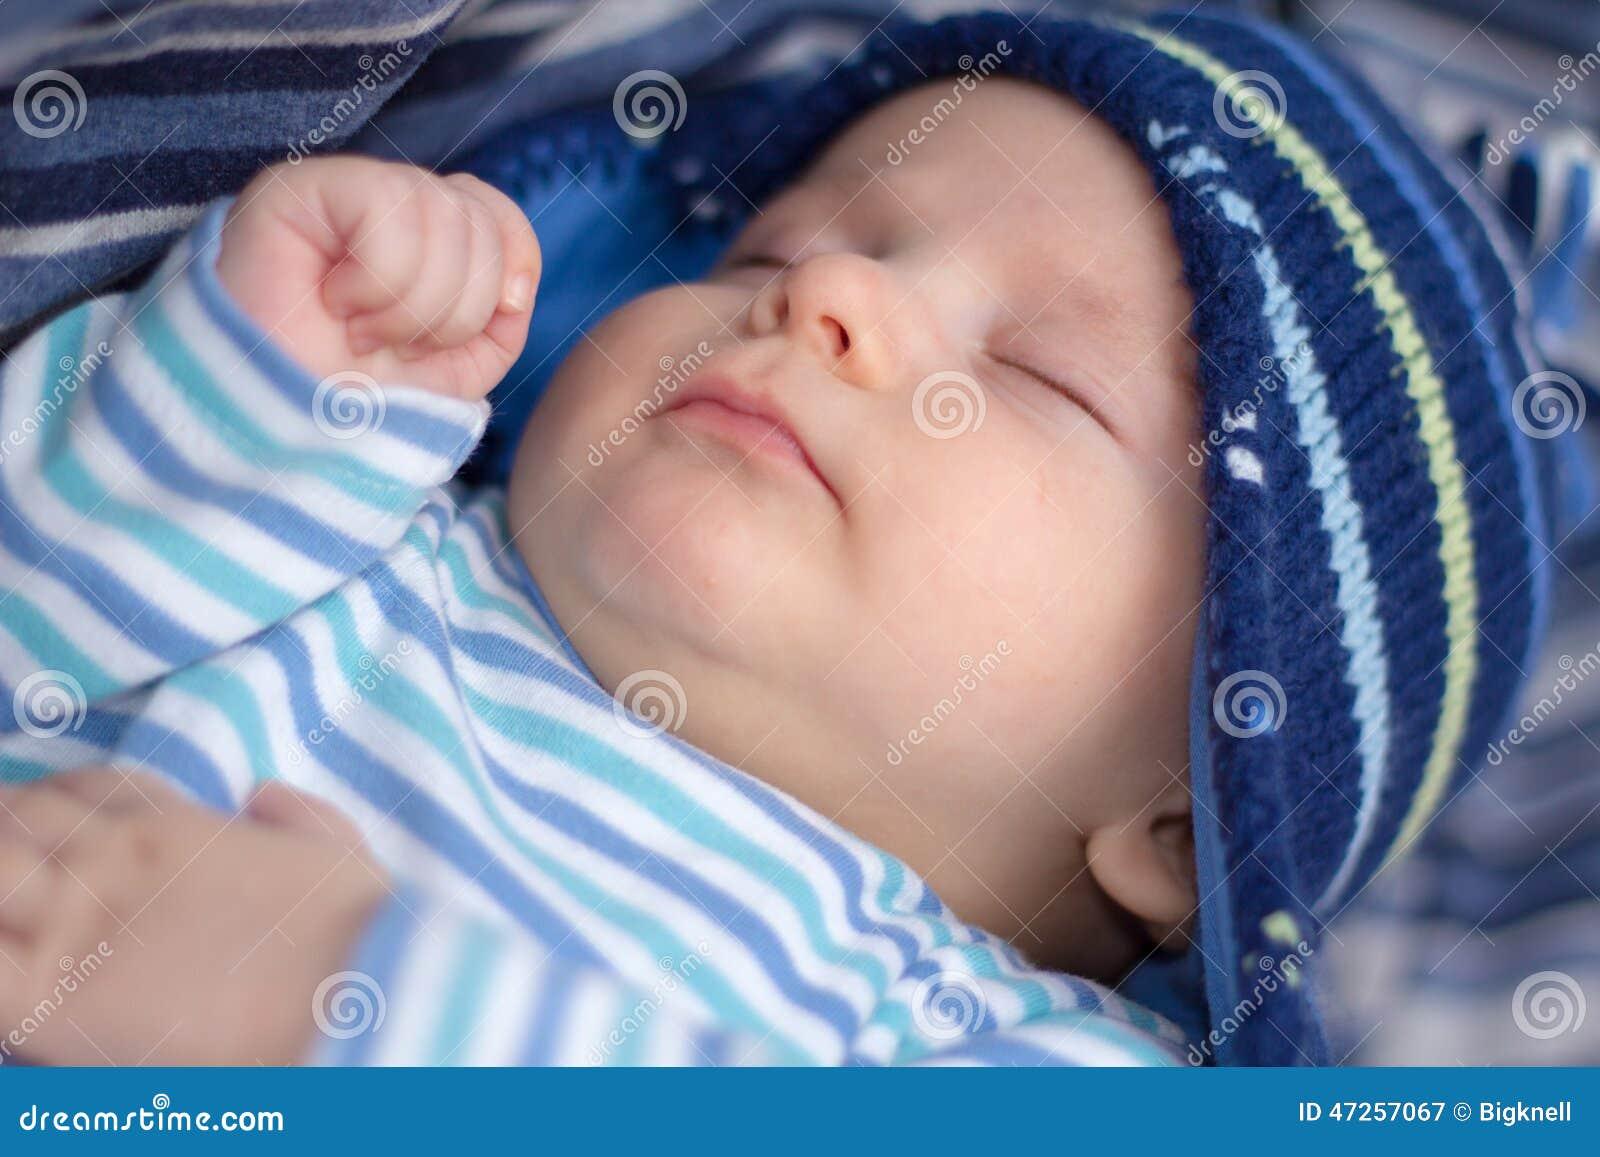 Newborn baby boy sleeping stock image. Image of asleep - 47257067 da781a5f54df